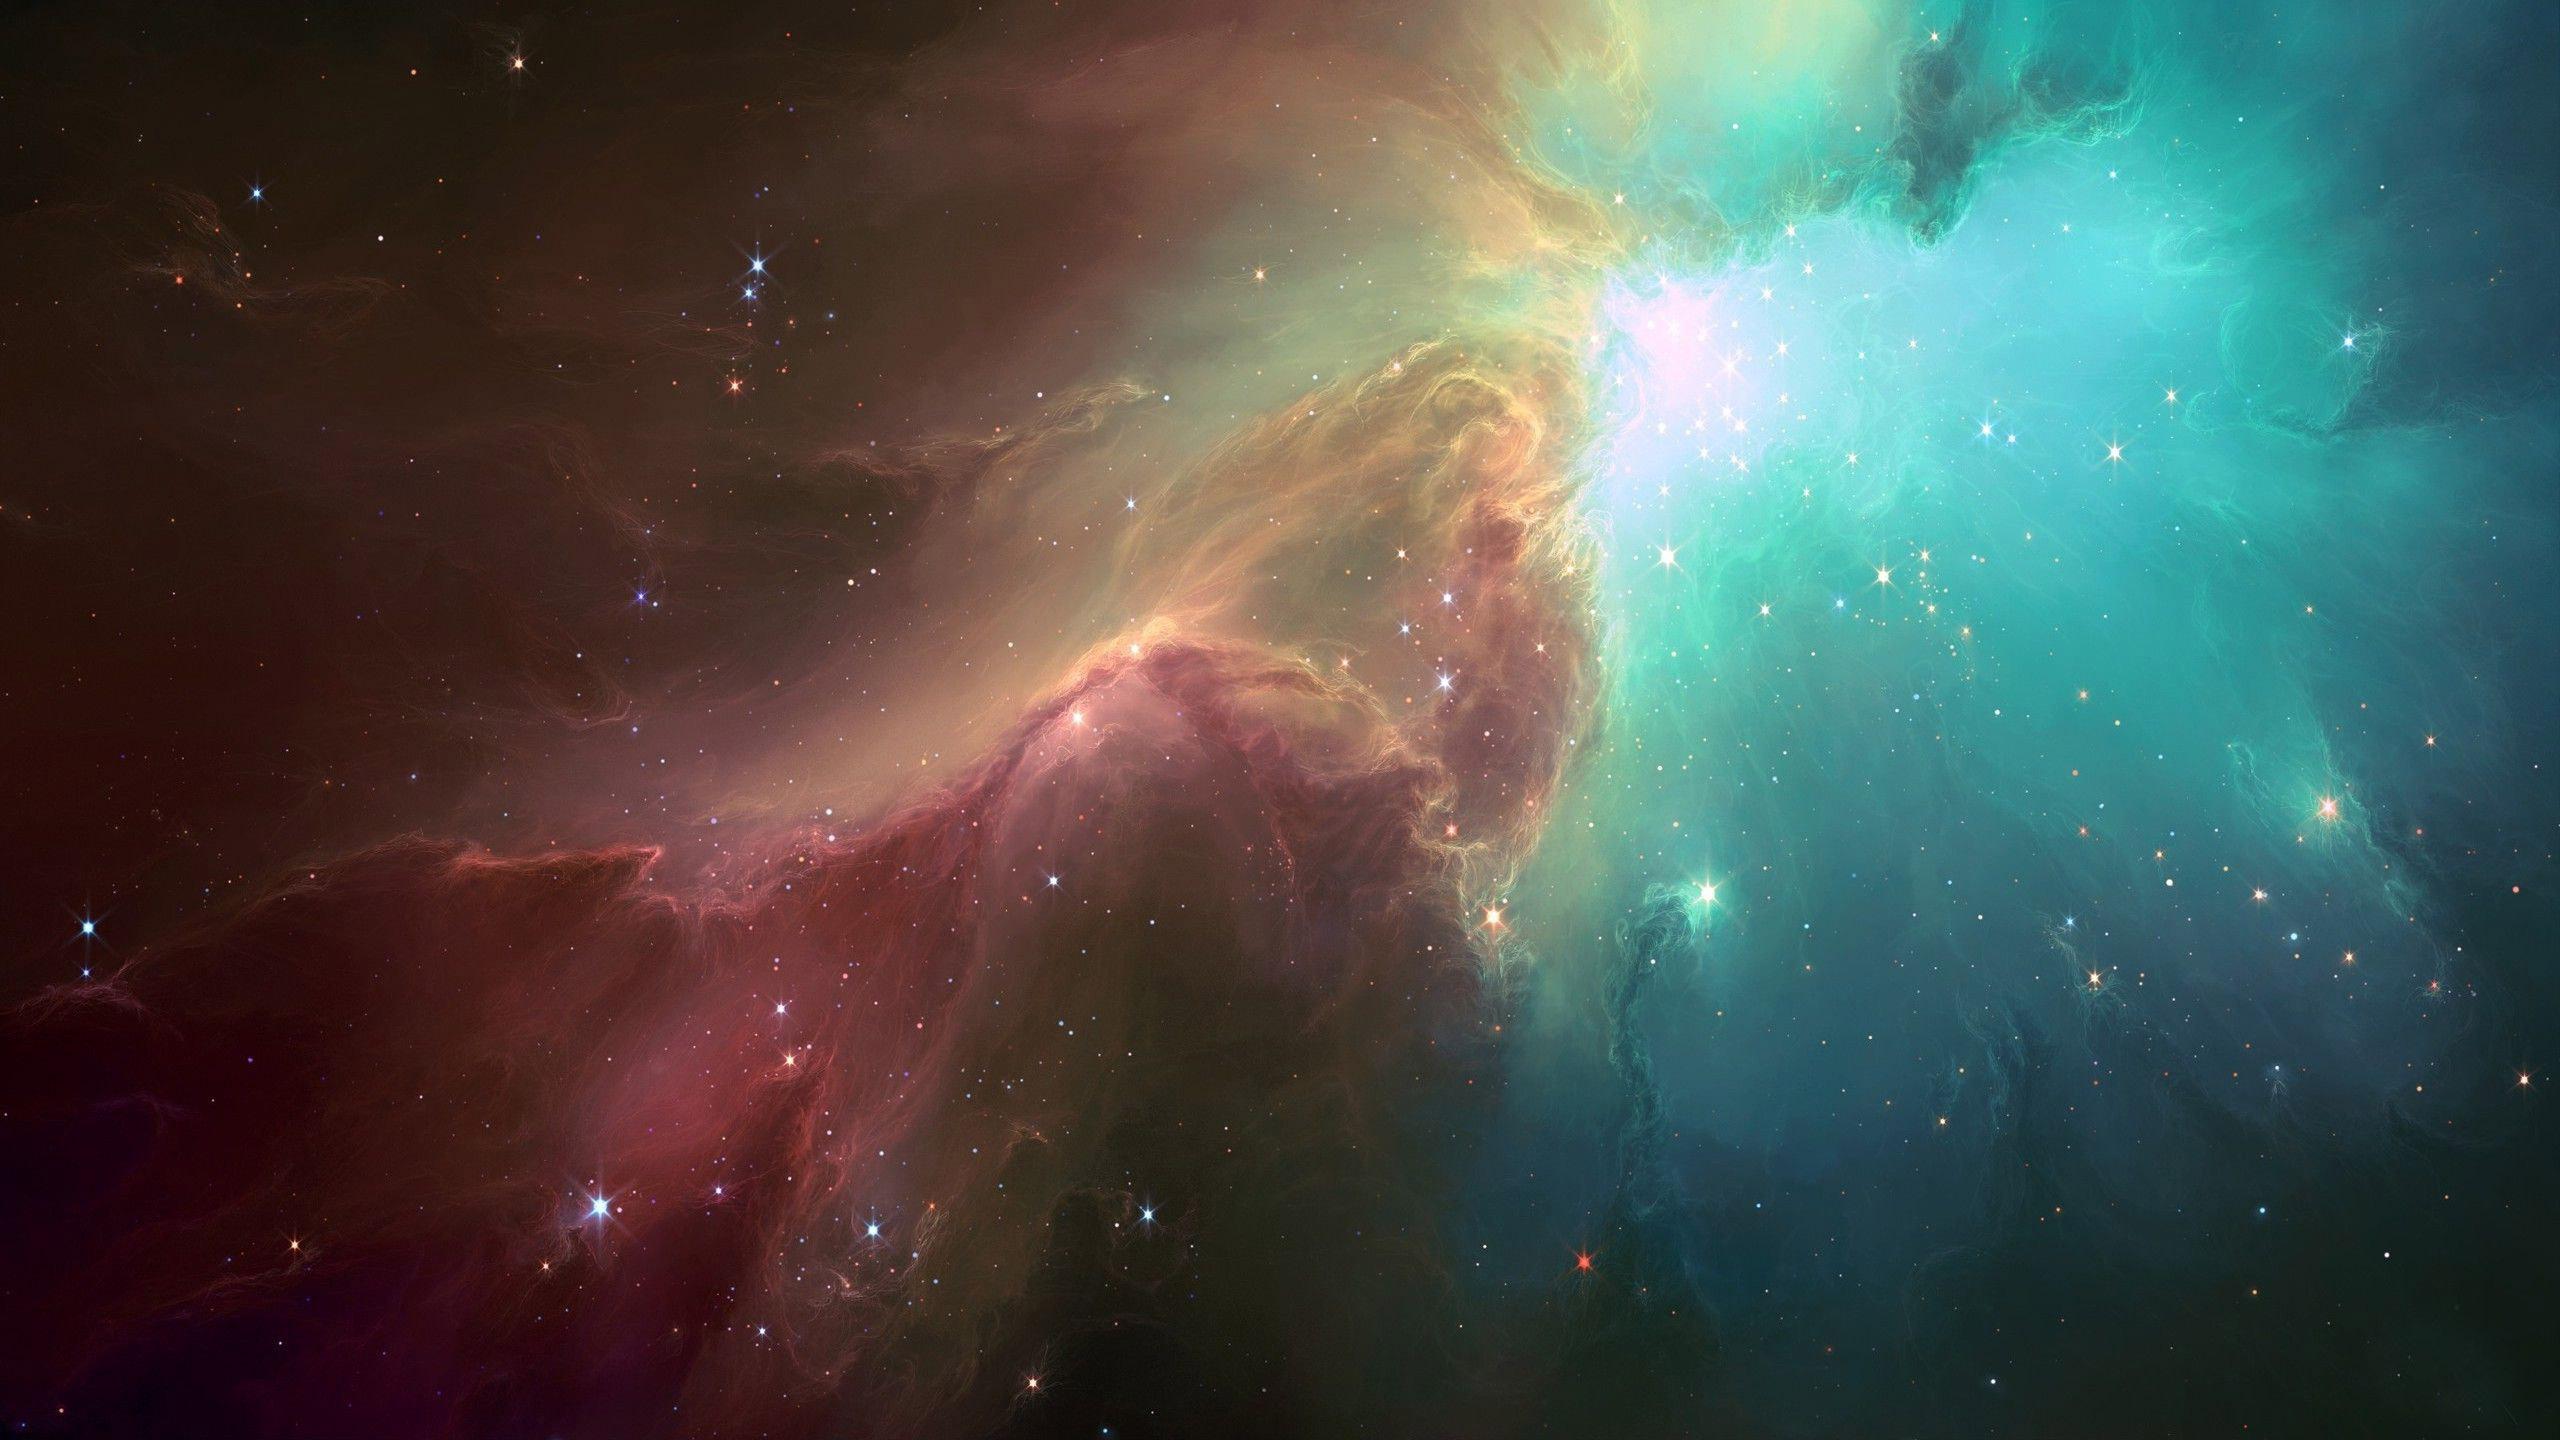 3D Nebula Wallpaper   Pics about space 2560x1440